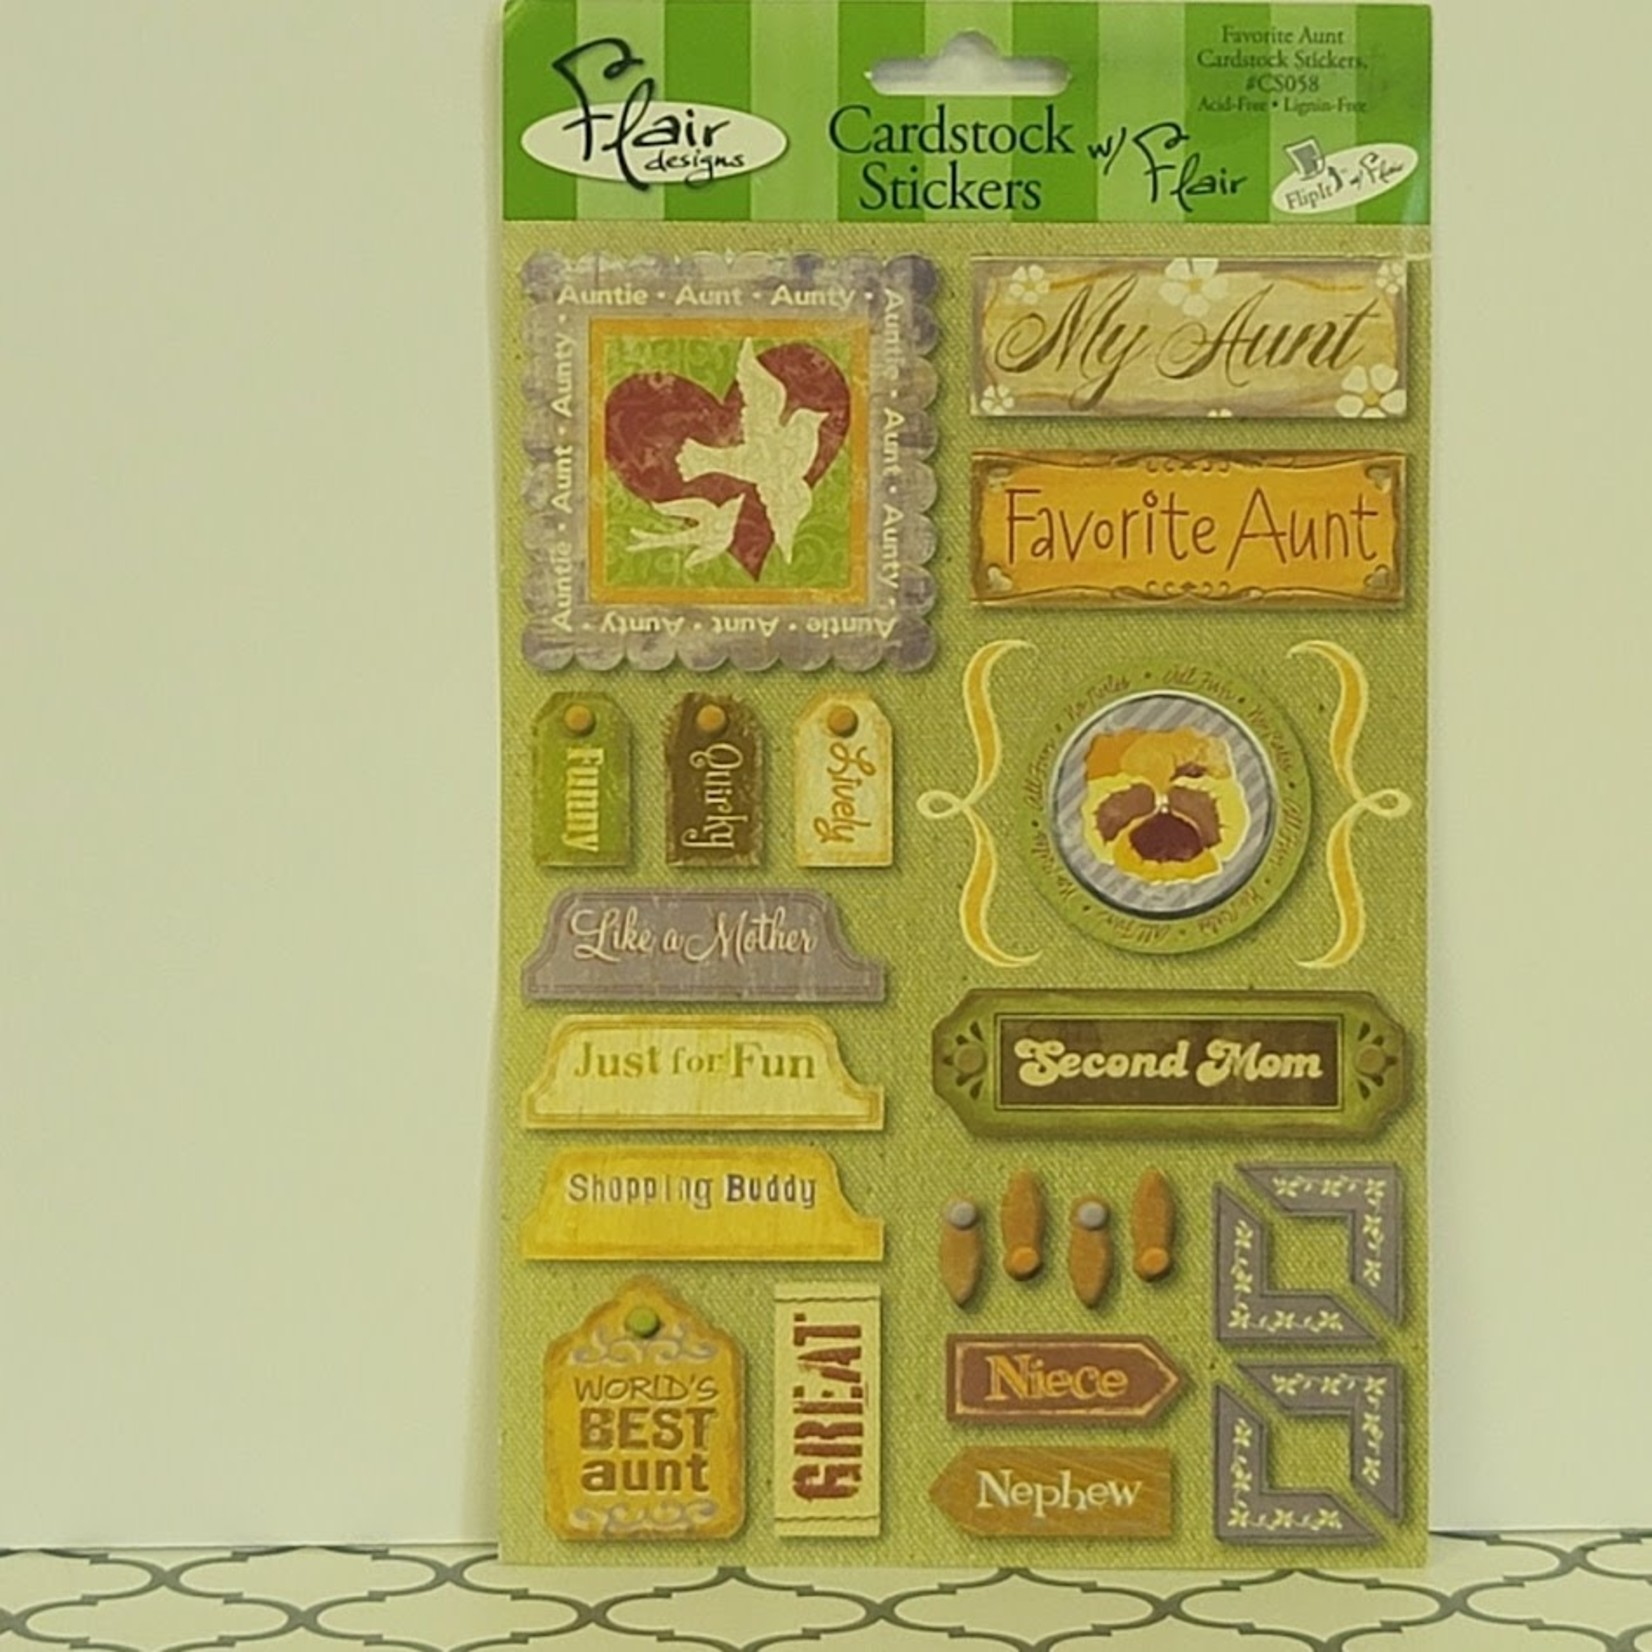 Cardstock Stickers - Favorite Aunt